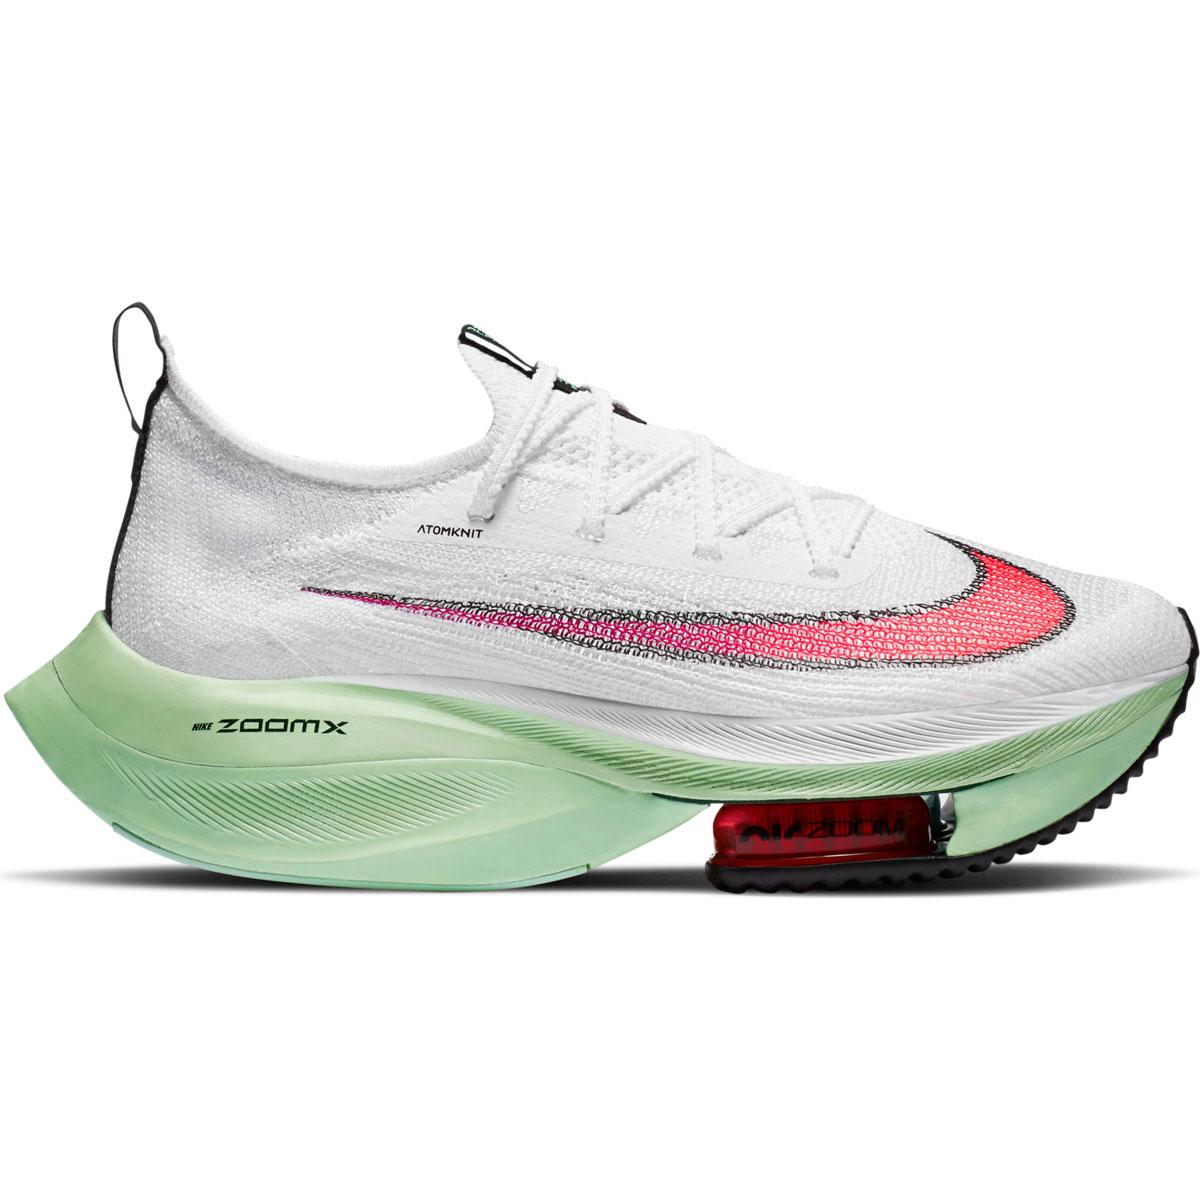 Women's Nike Air Zoom Alphafly Next% Running Shoe - Color: White/Flash Crimson/Jade Aura - Size: 5 - Width: Regular, White/Flash Crimson/Jade Aura, large, image 1